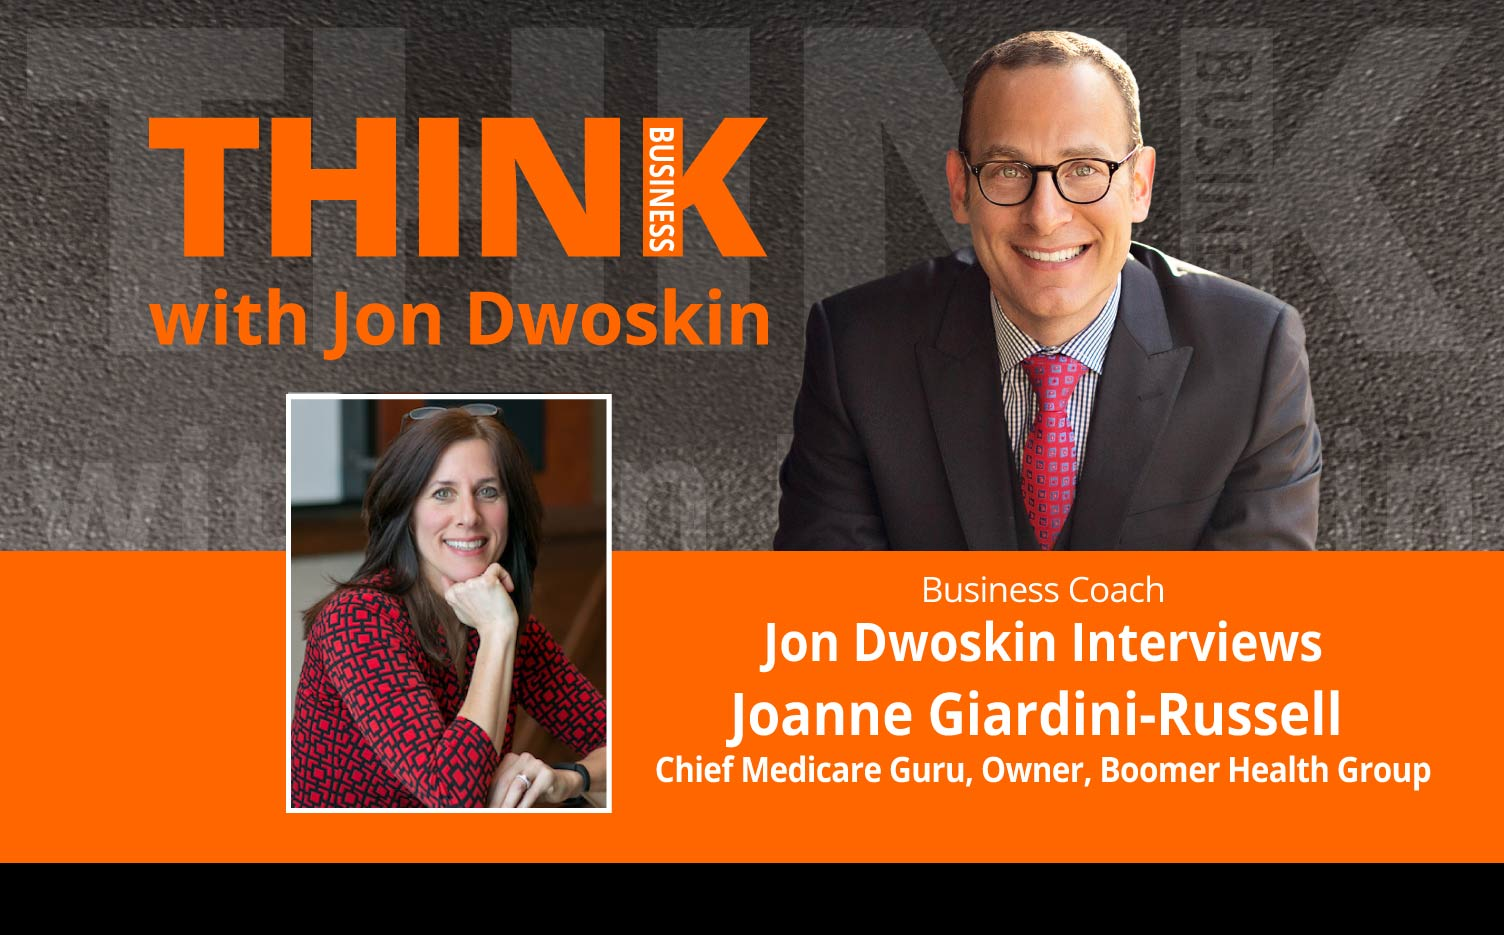 THINK Business Podcast: Jon Dwoskin Interviews Joanne Giardini-Russell, Chief Medicare Guru, Owner, Boomer Health Group